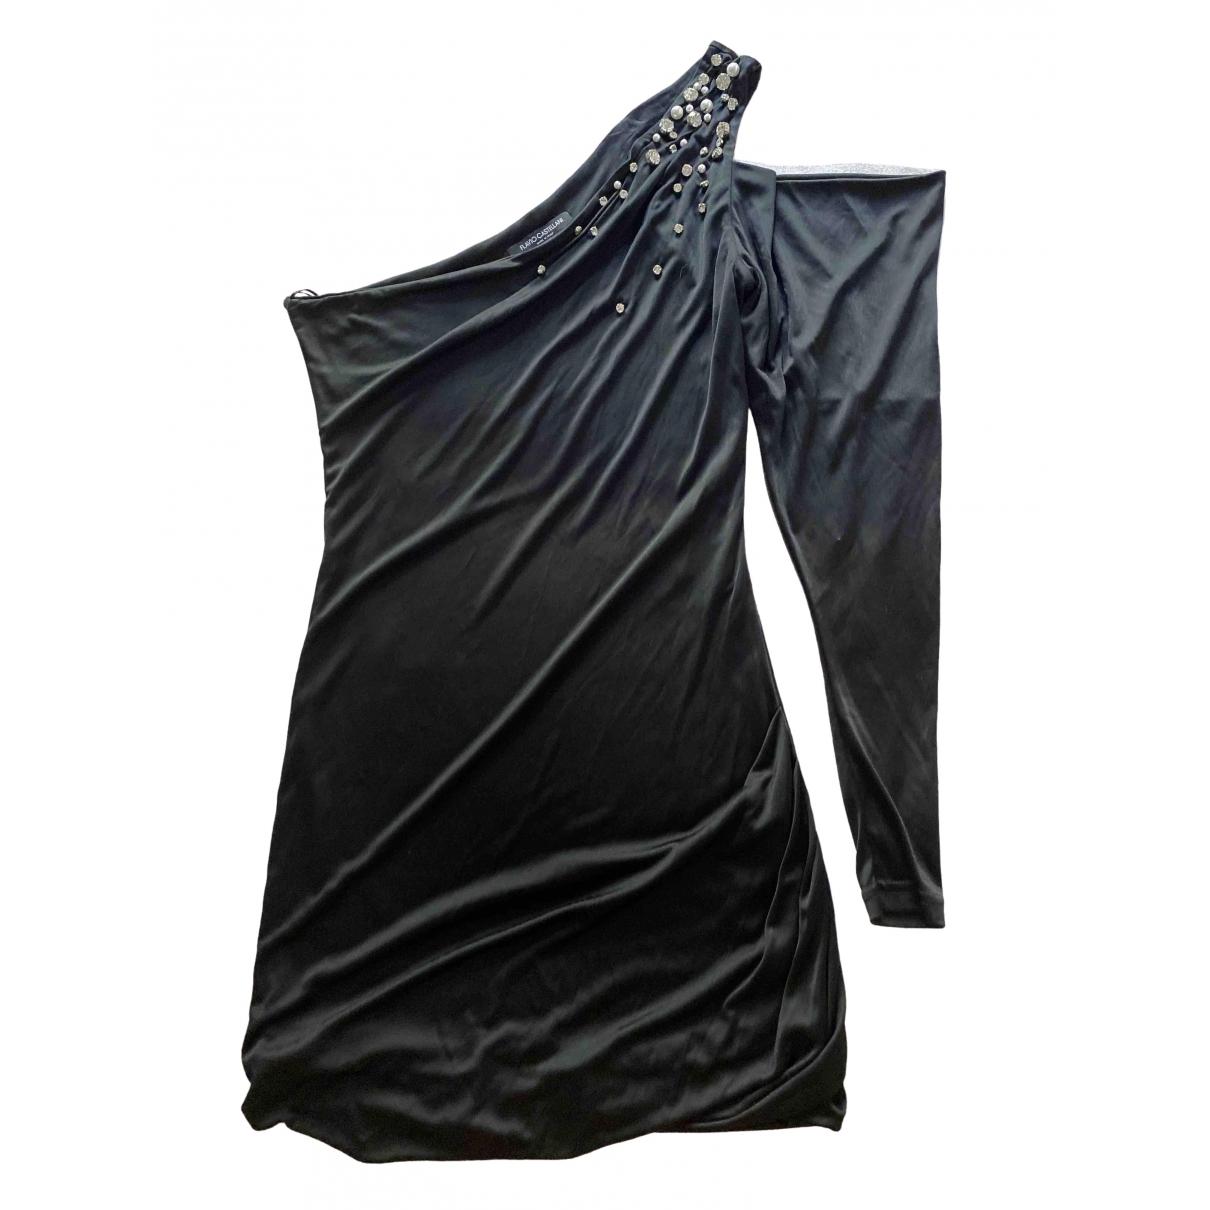 Flavio Castellani \N Kleid in  Schwarz Baumwolle - Elasthan